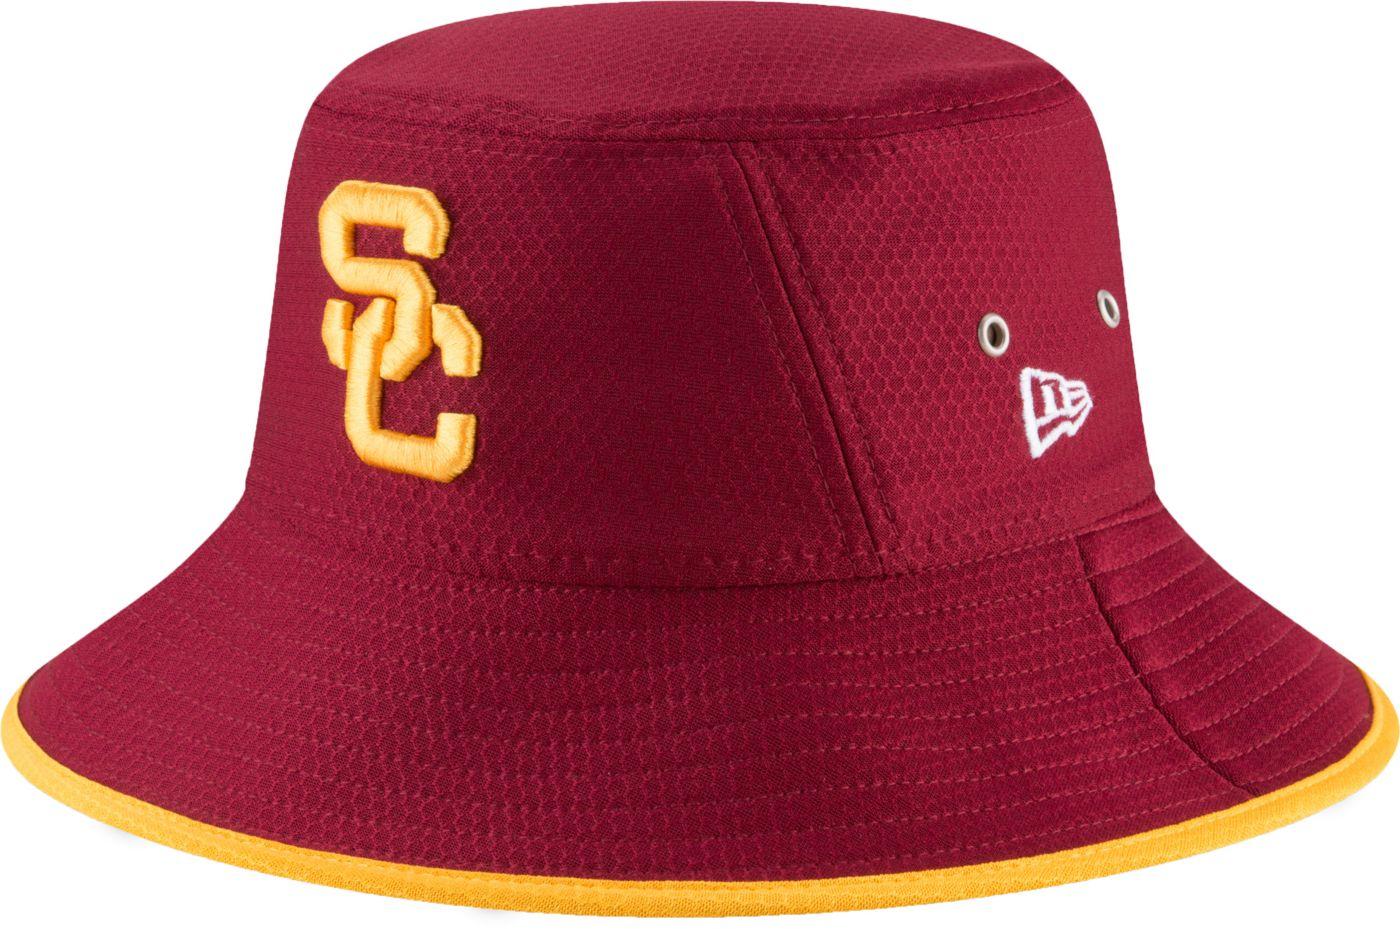 New Era Men's USC Trojans Cardinal Team Bucket Hat